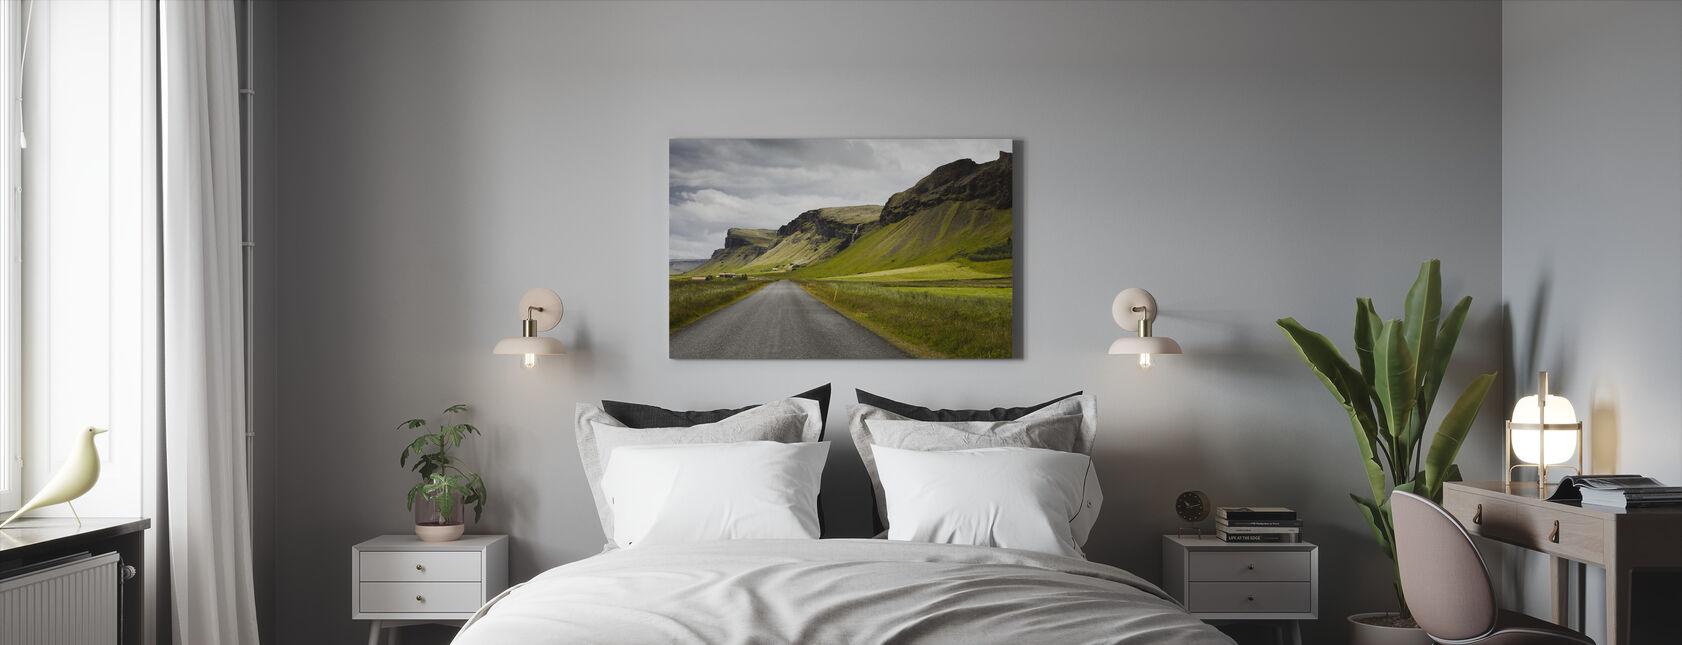 Islannin muodot - Canvastaulu - Makuuhuone